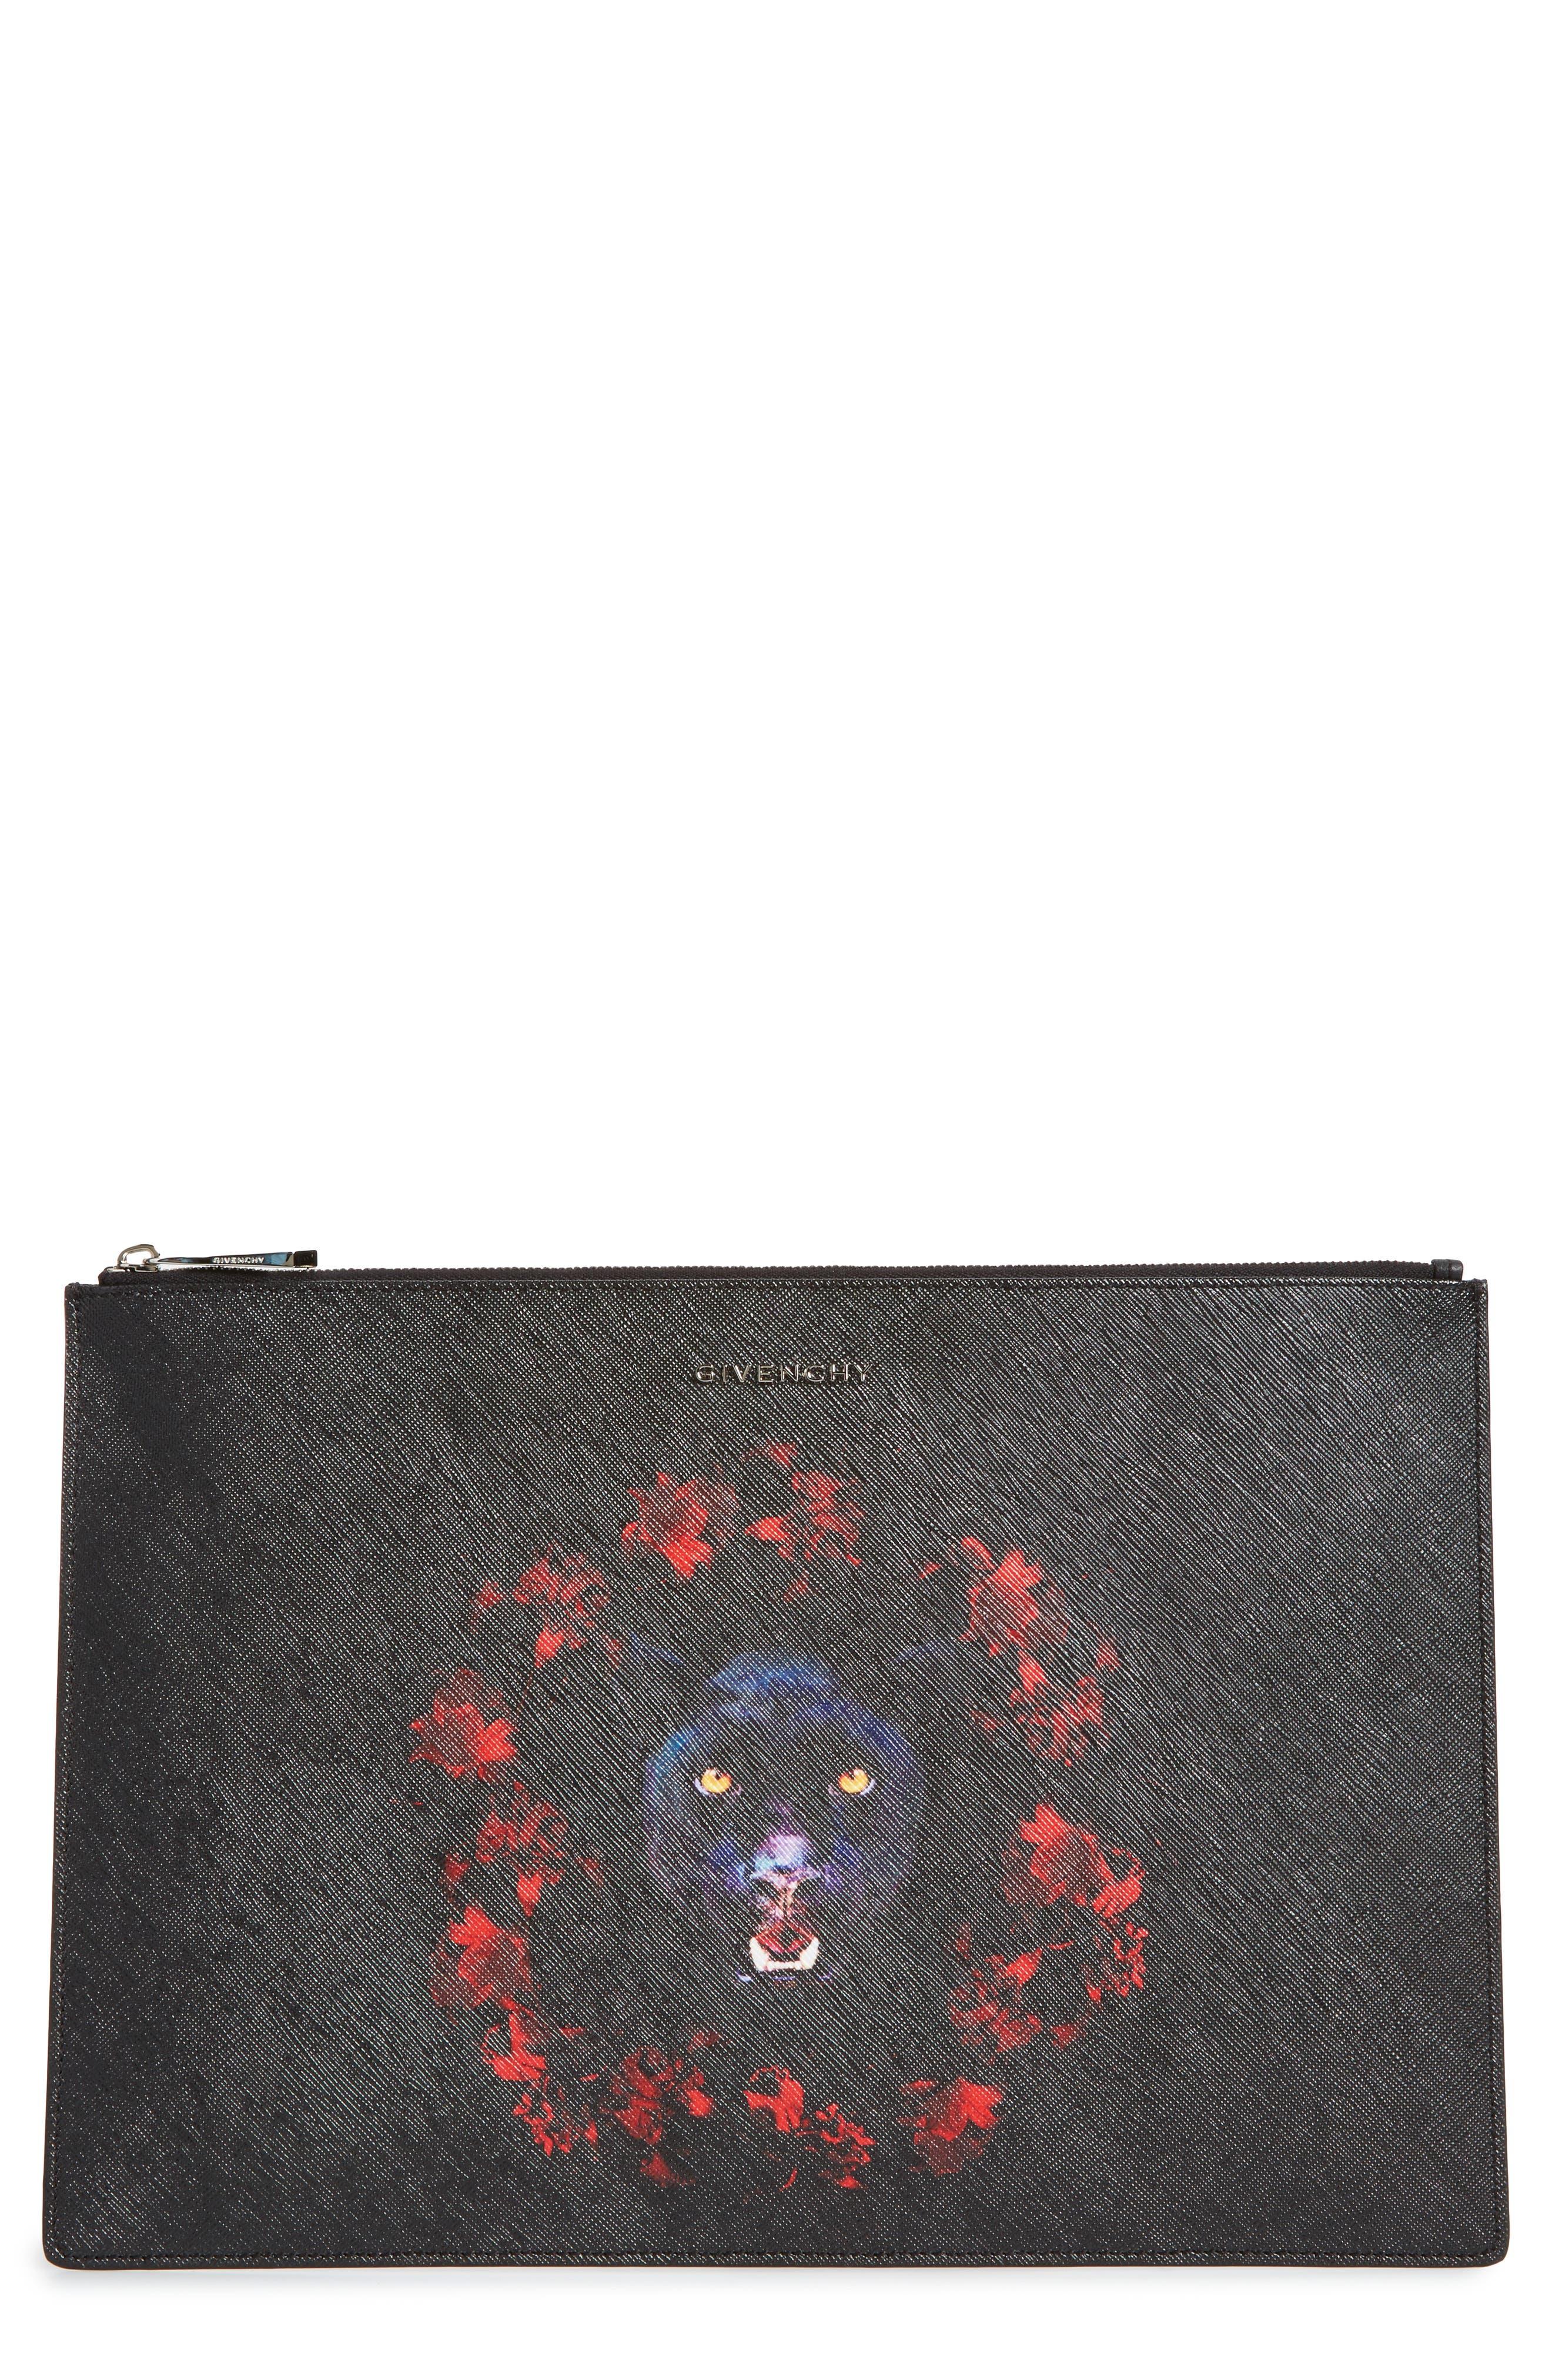 Alternate Image 1 Selected - Givenchy Jaguar Zip Pouch